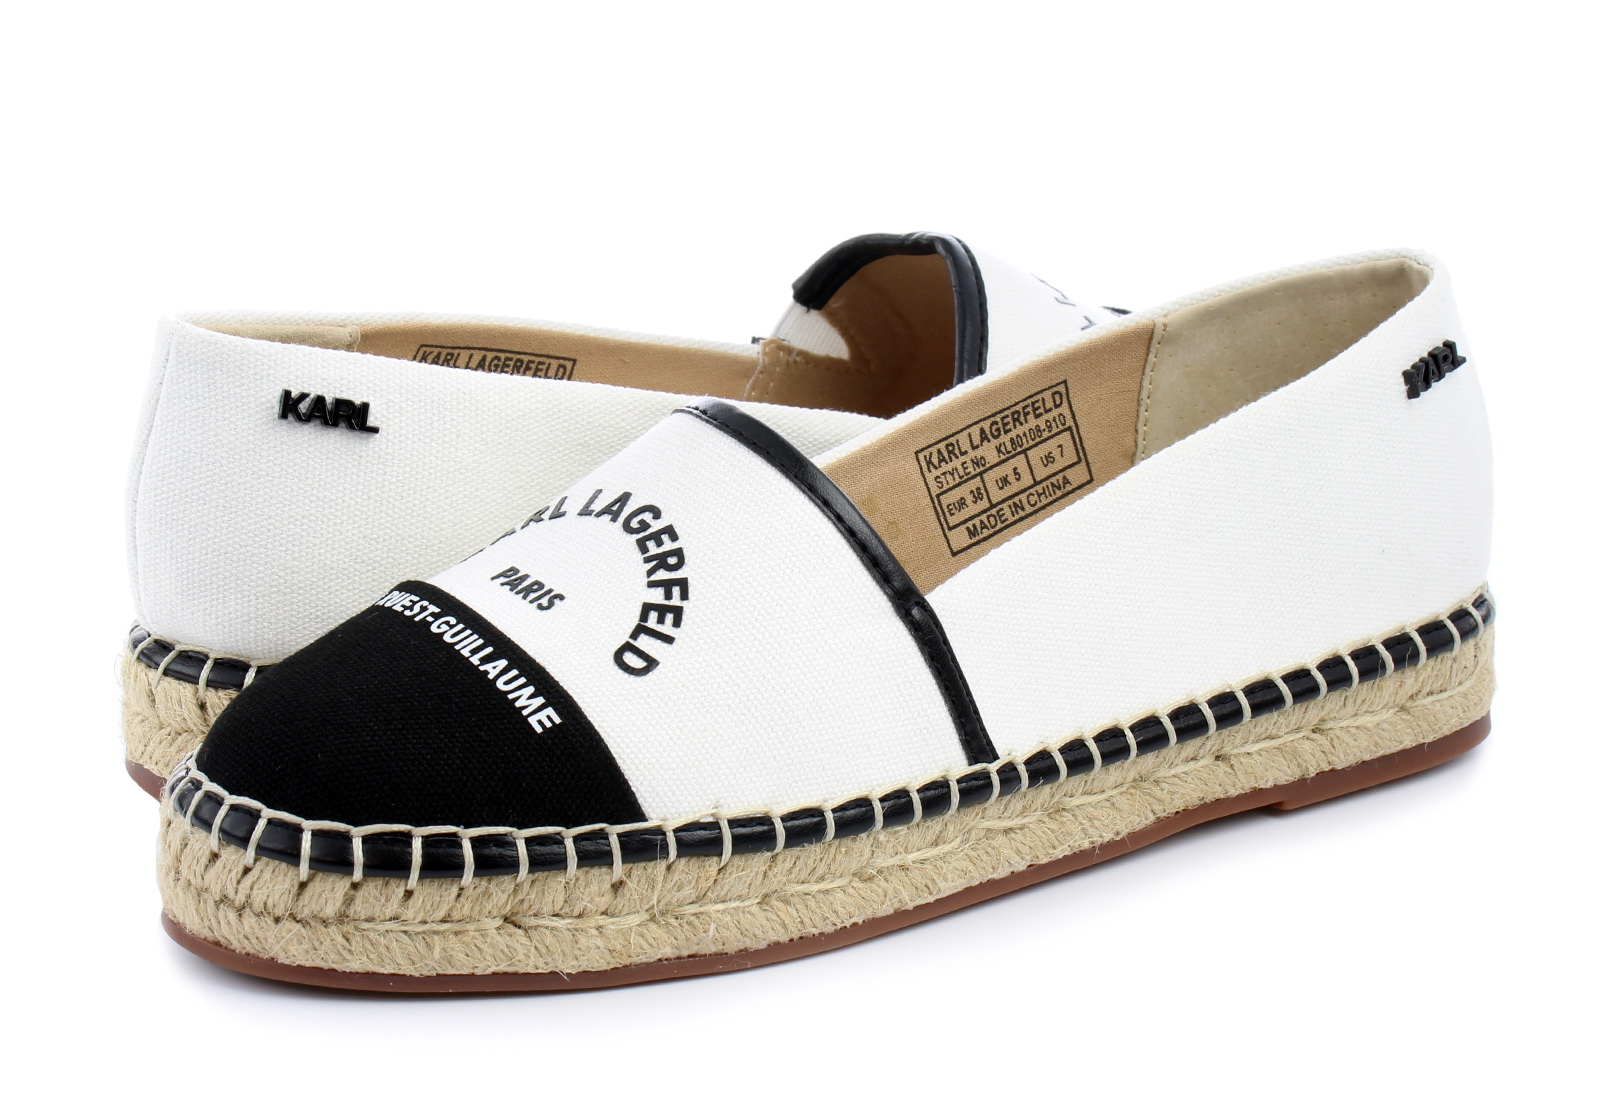 Karl Lagerfeld Cipele Kamini Maison